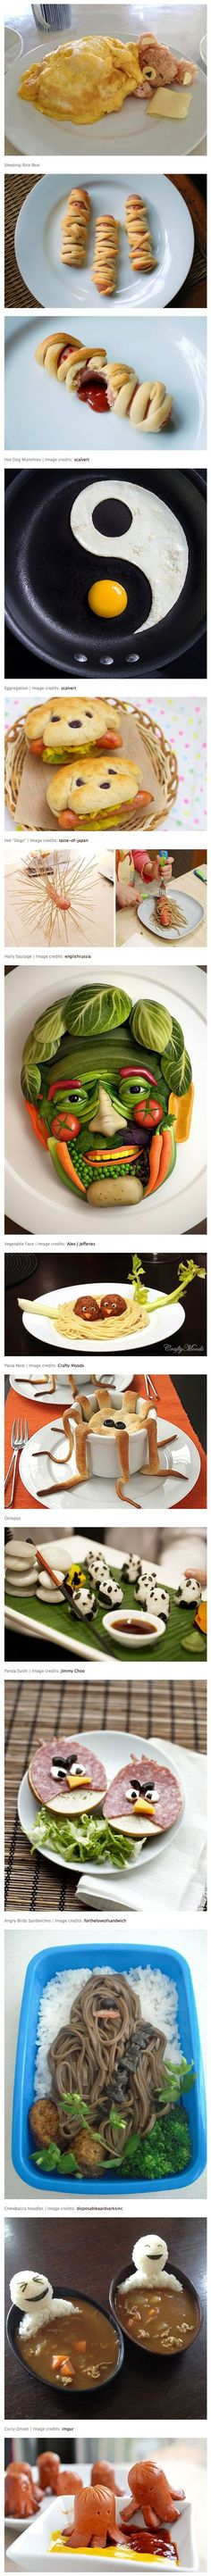 Cool and Creative Food Art Ideas